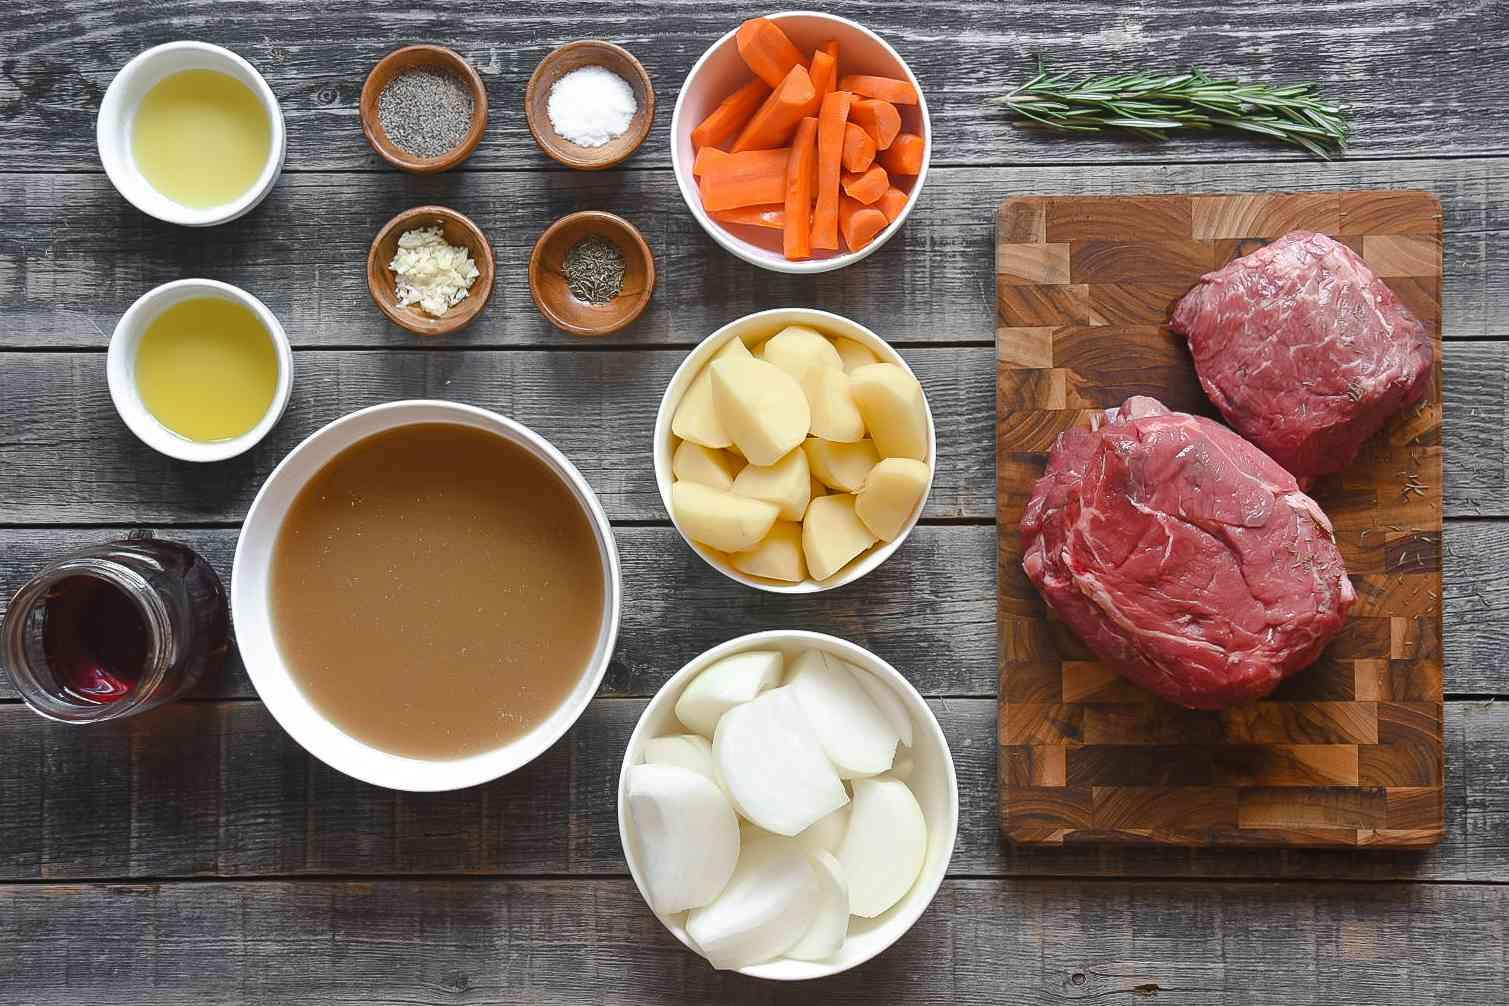 Southern Pot Roast ingredients